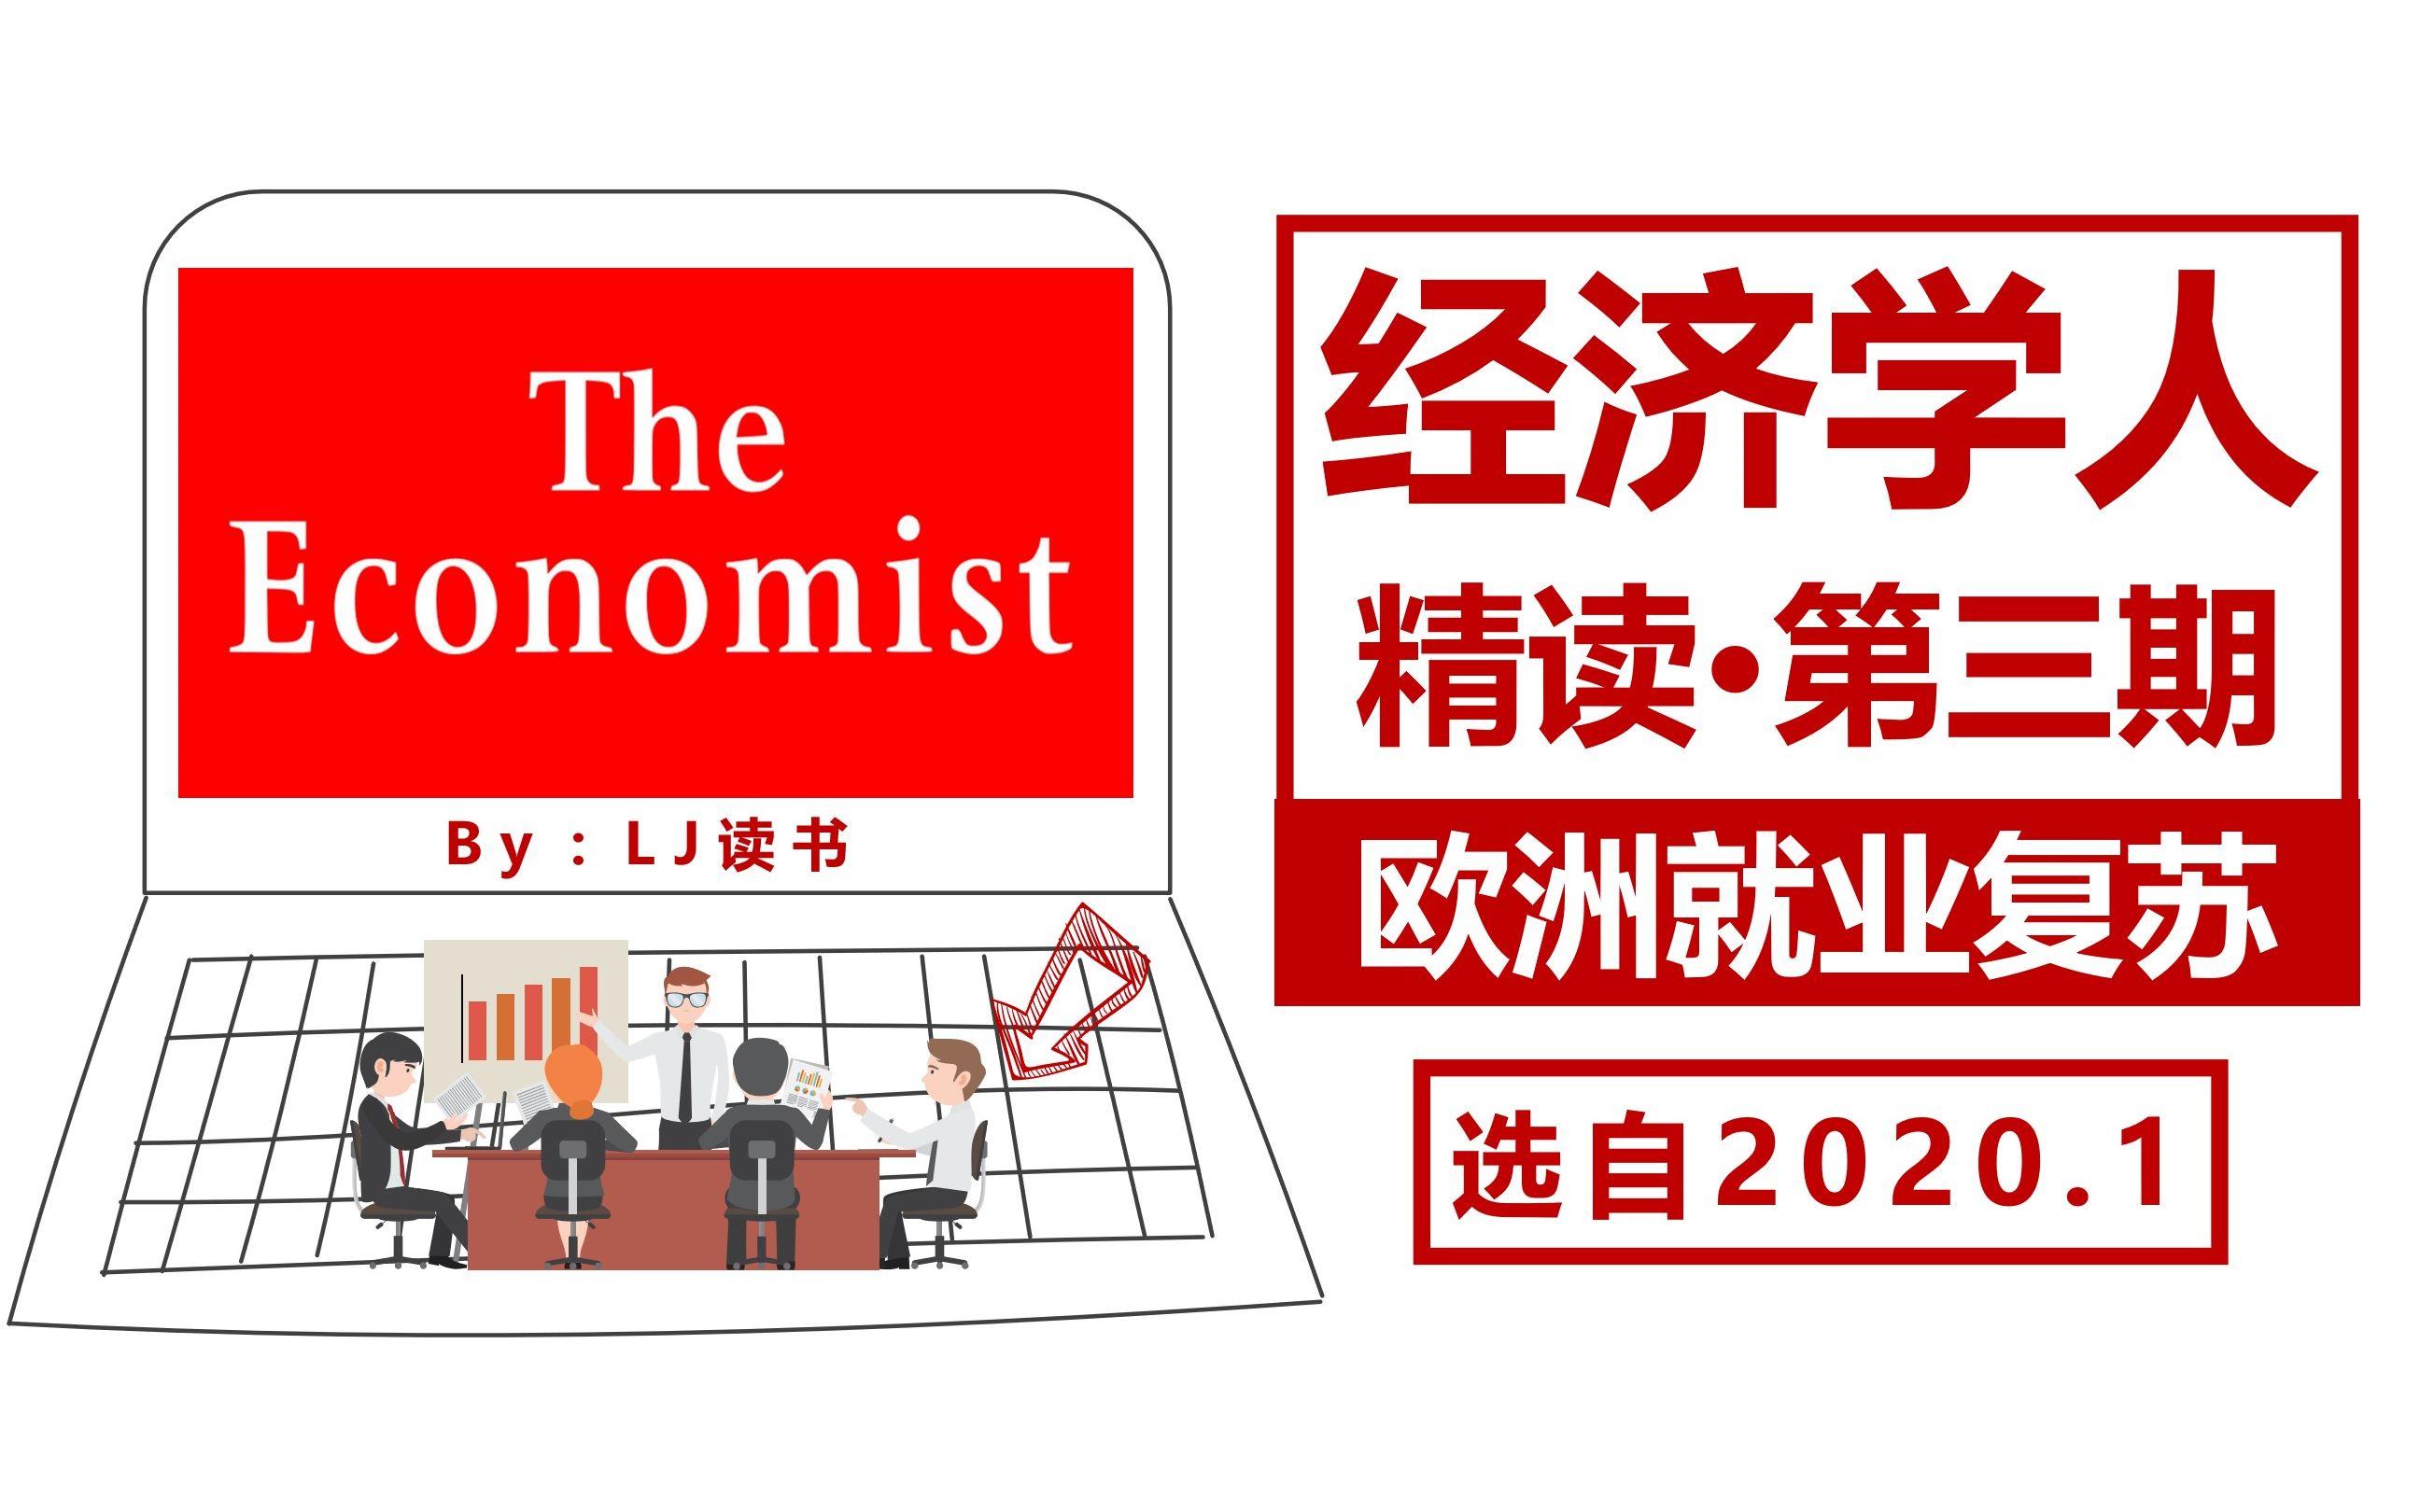 ted演讲中英文对照_【英语】《经济学人》 精读 (第一季·3期)_哔哩哔哩 (゜-゜)つ ...